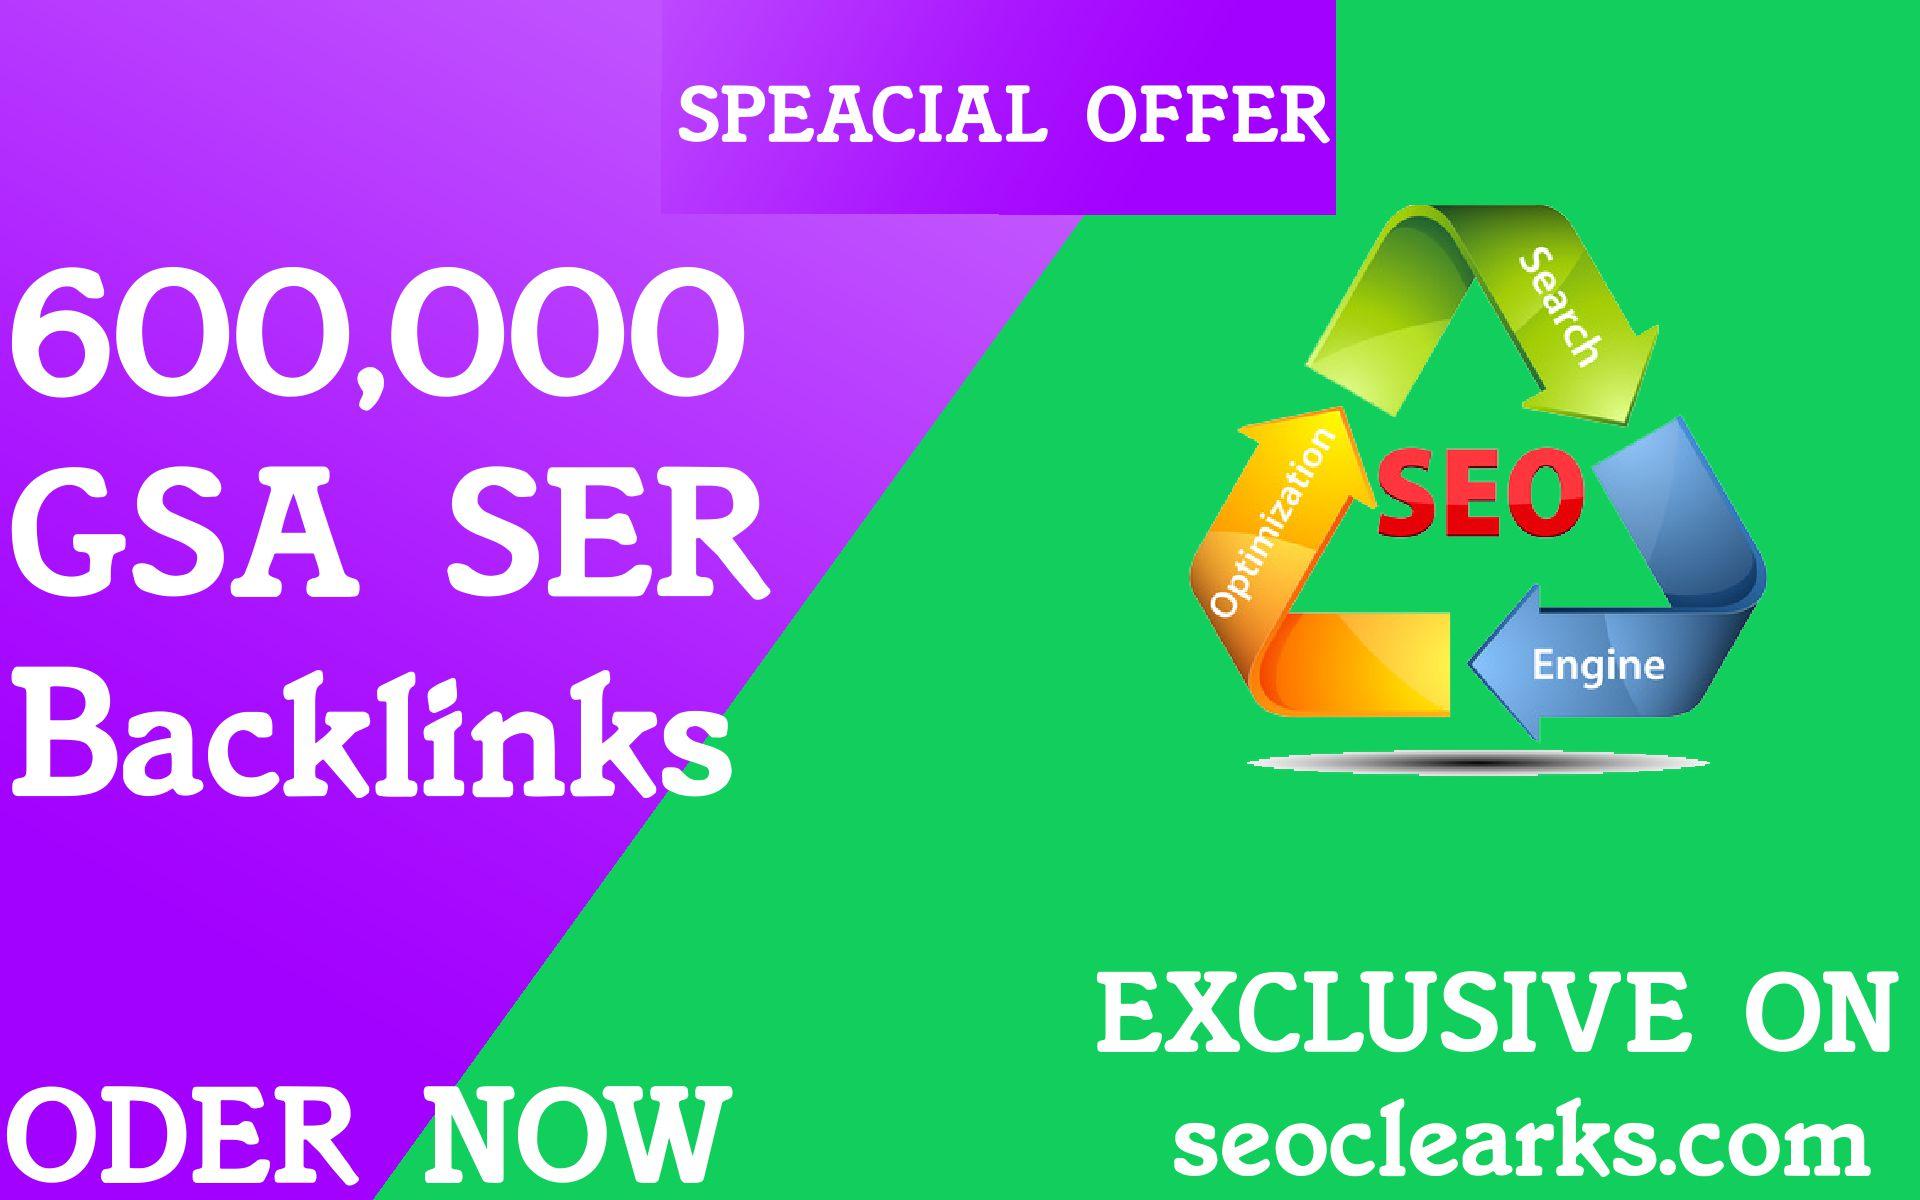 600,000 GSA SER Verified Backlinks for SEO Ranking